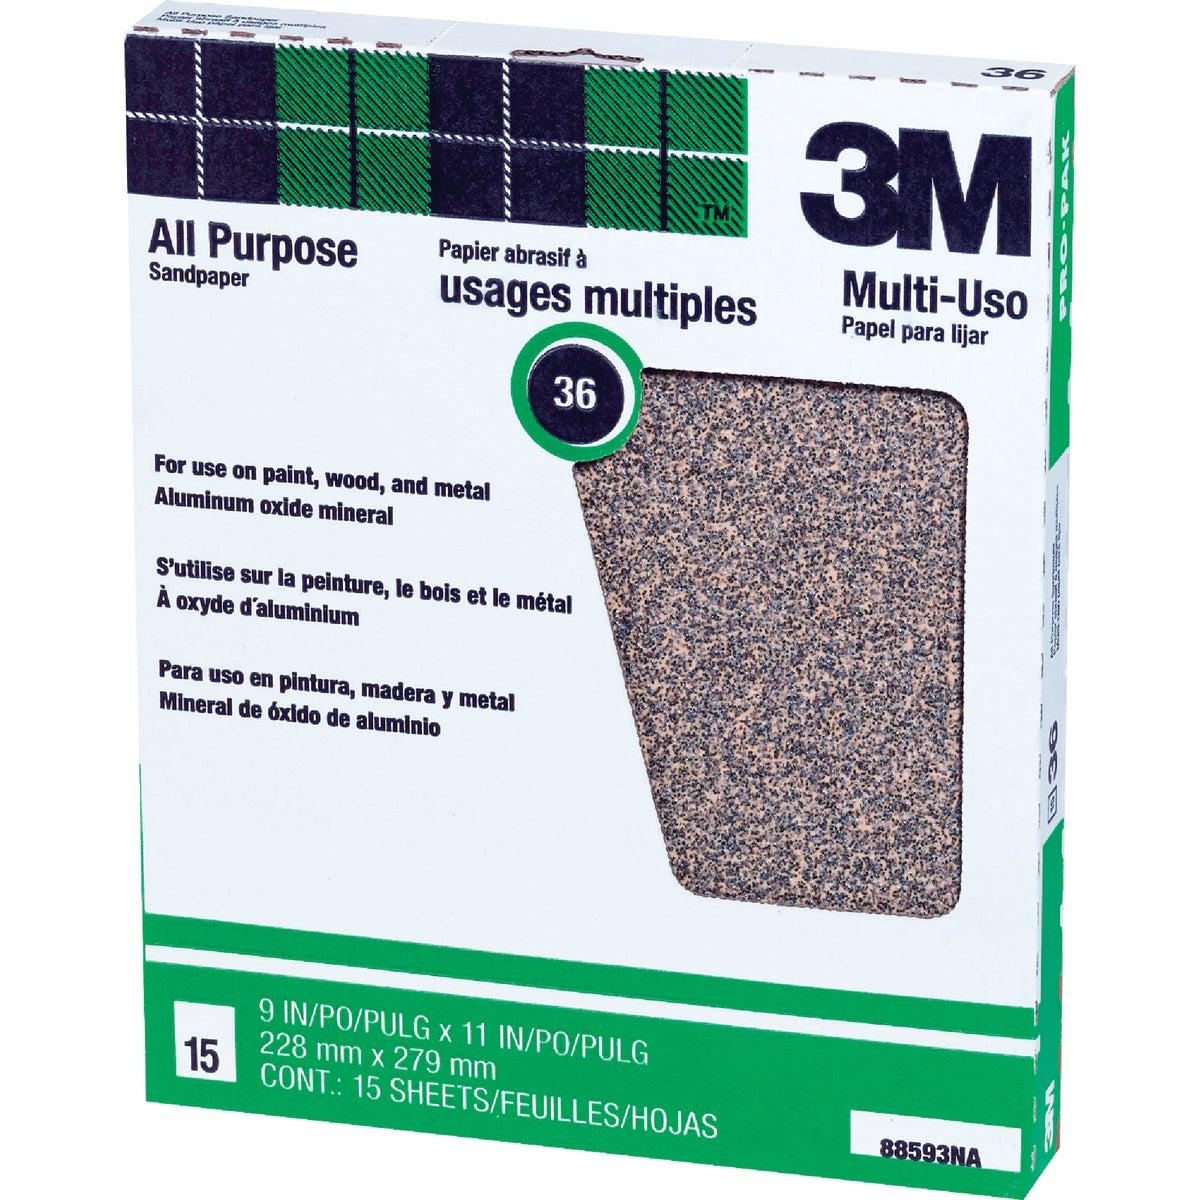 3M All Purpose Sandpape-